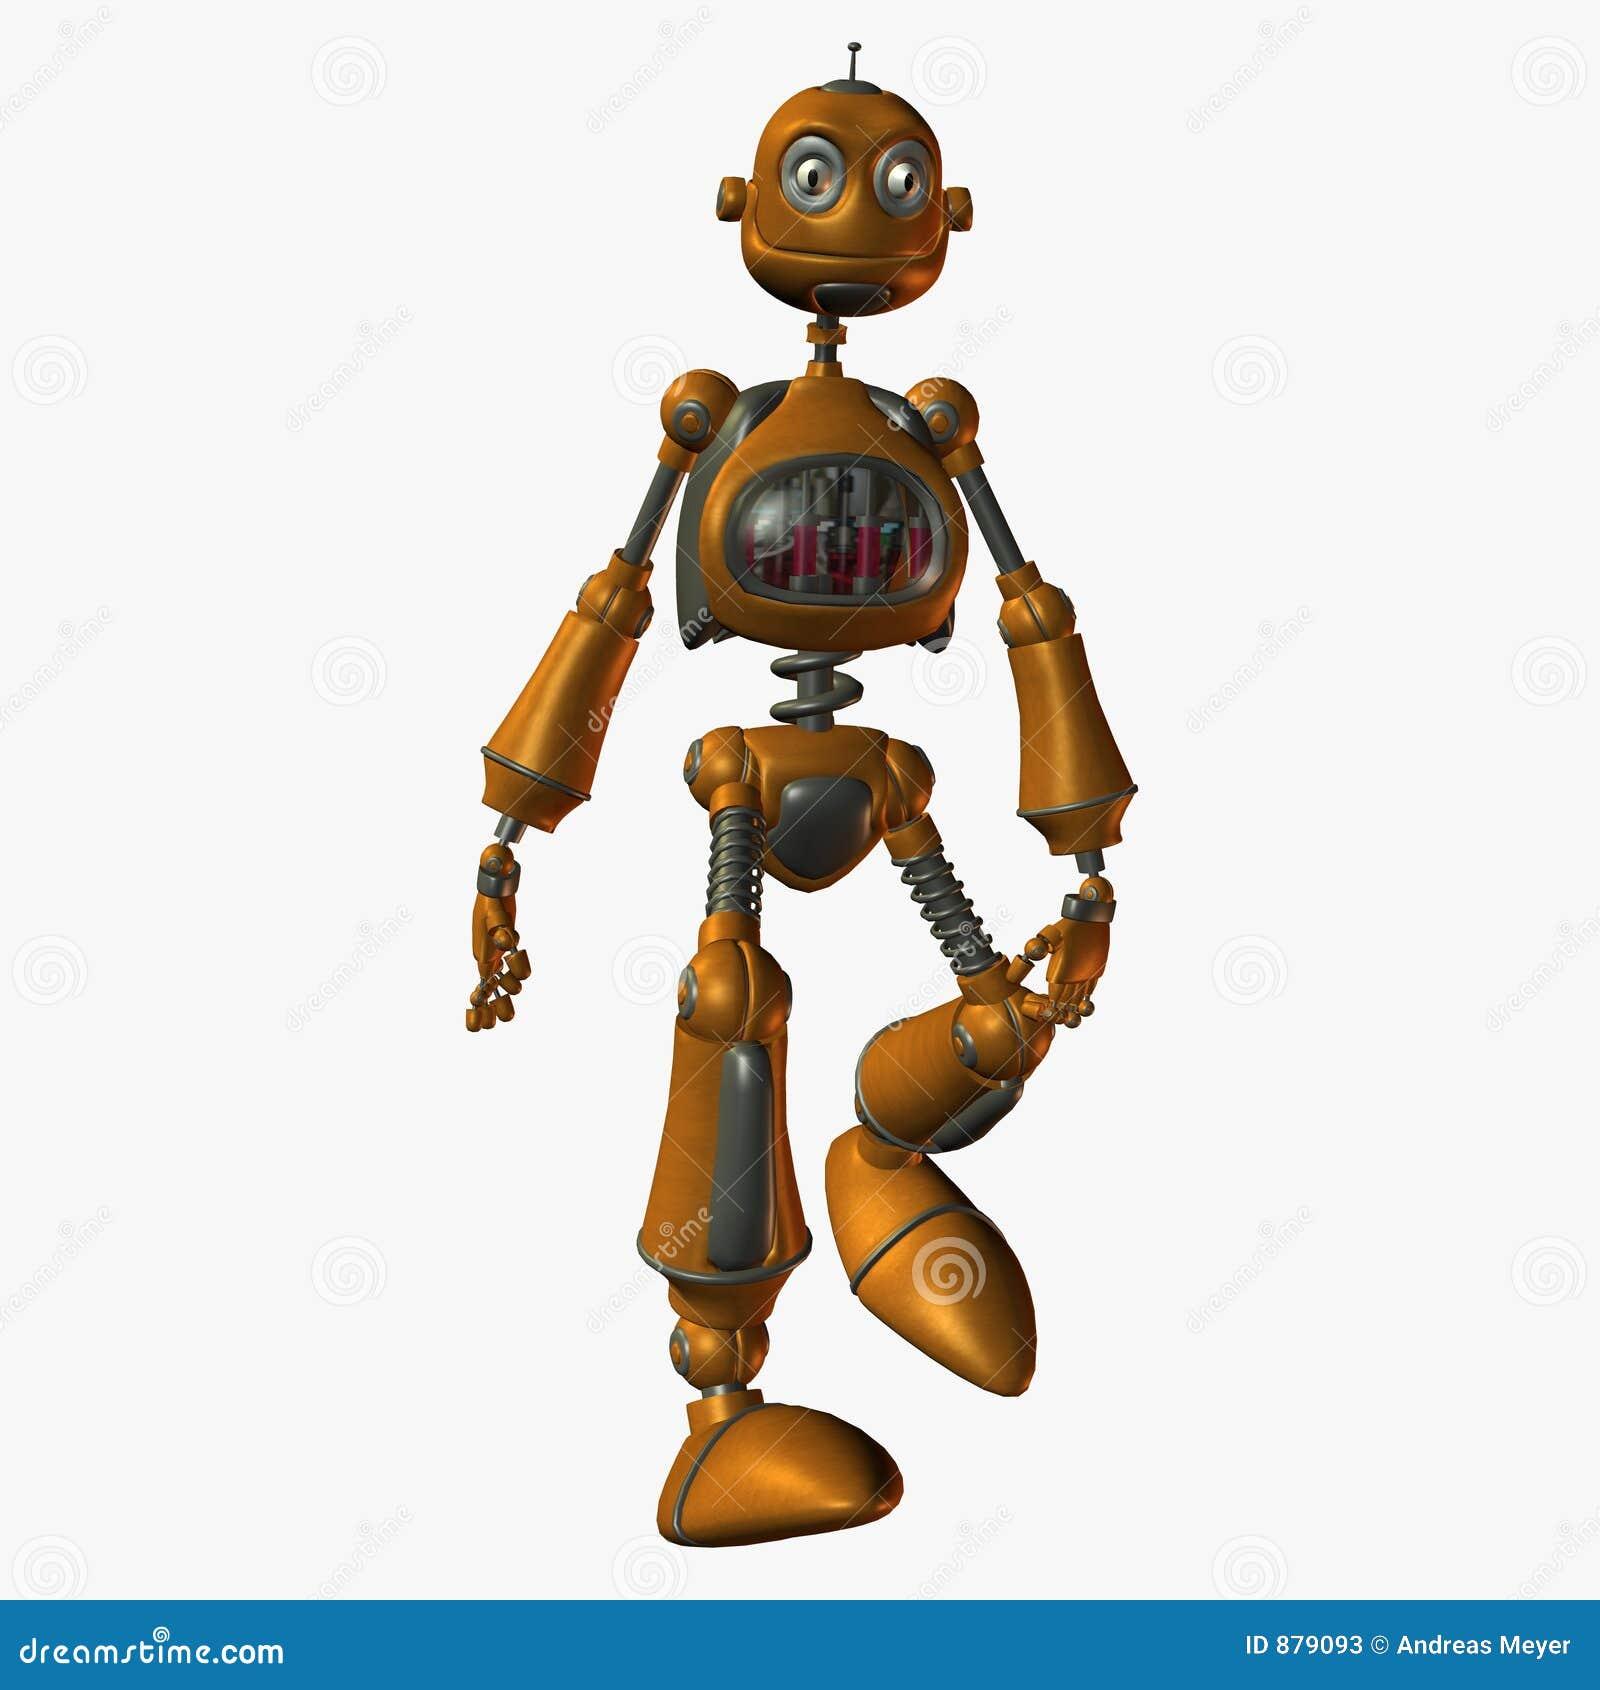 Robot toonimal